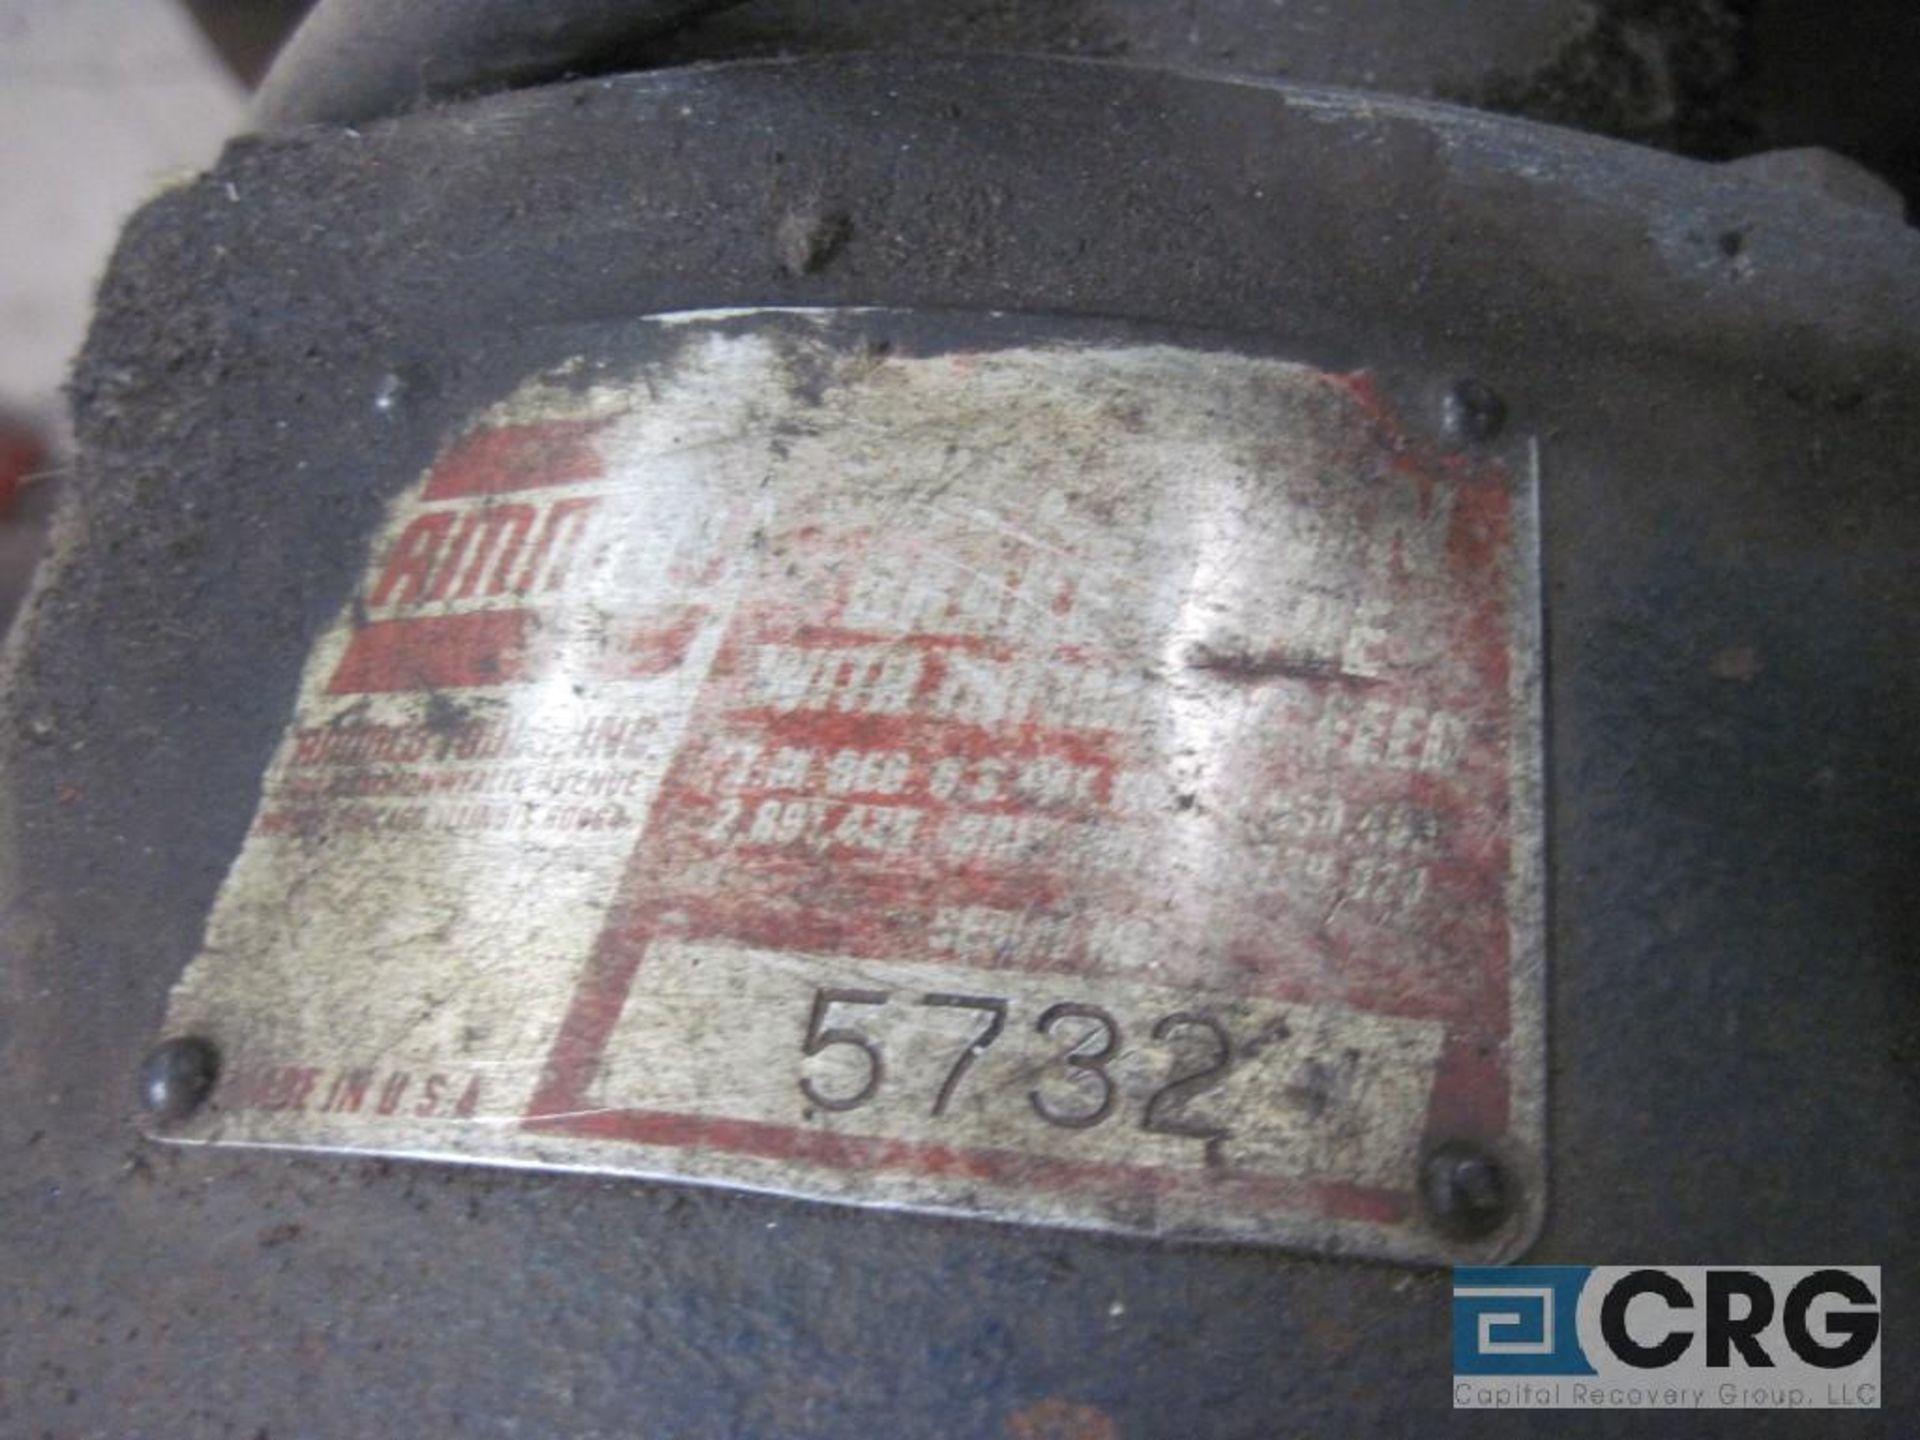 Ammco brake lathe w/Ammco 7750 disk brake facing mechanism, twin face tool w/all brake lathe - Image 4 of 4